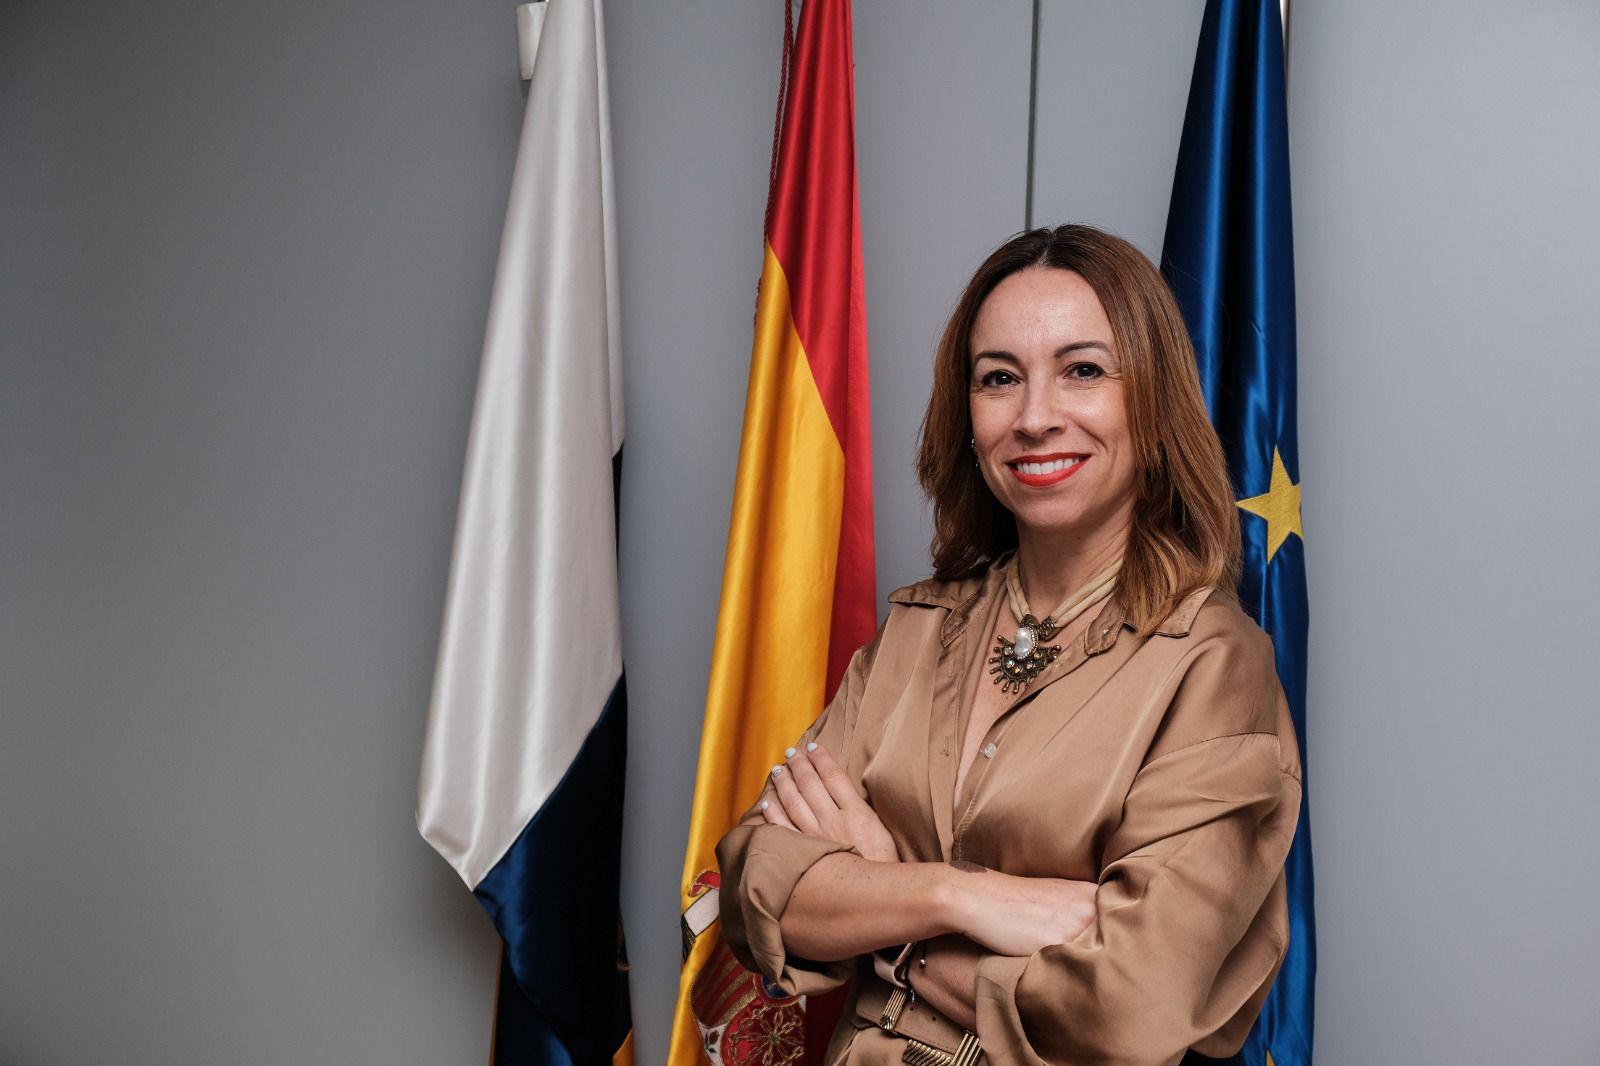 La directora general de Energía, Rosana Melián.